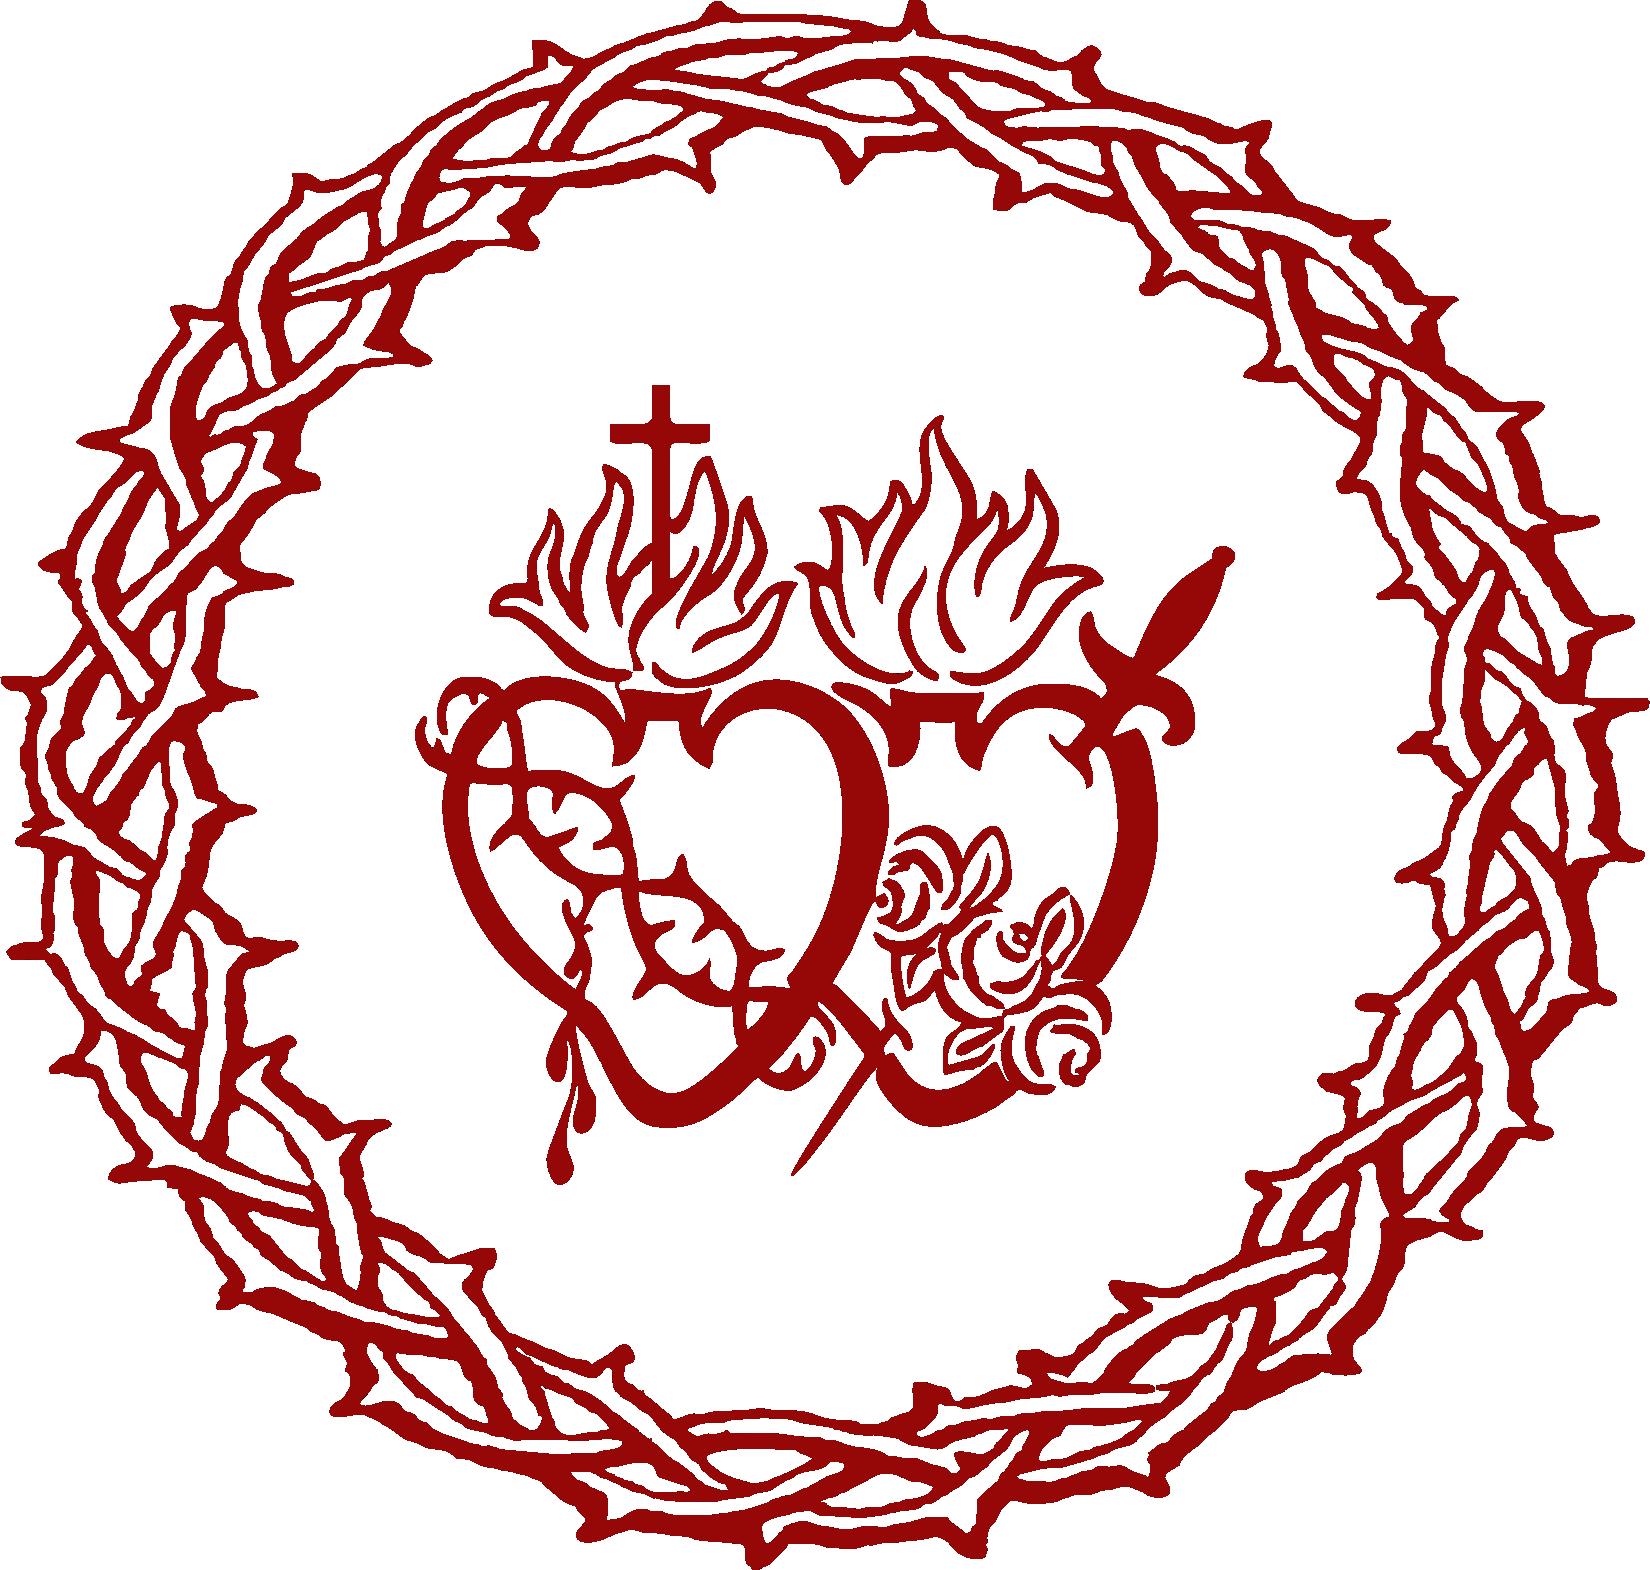 Sscc Logo Arabic Calligraphy Logos Calligraphy